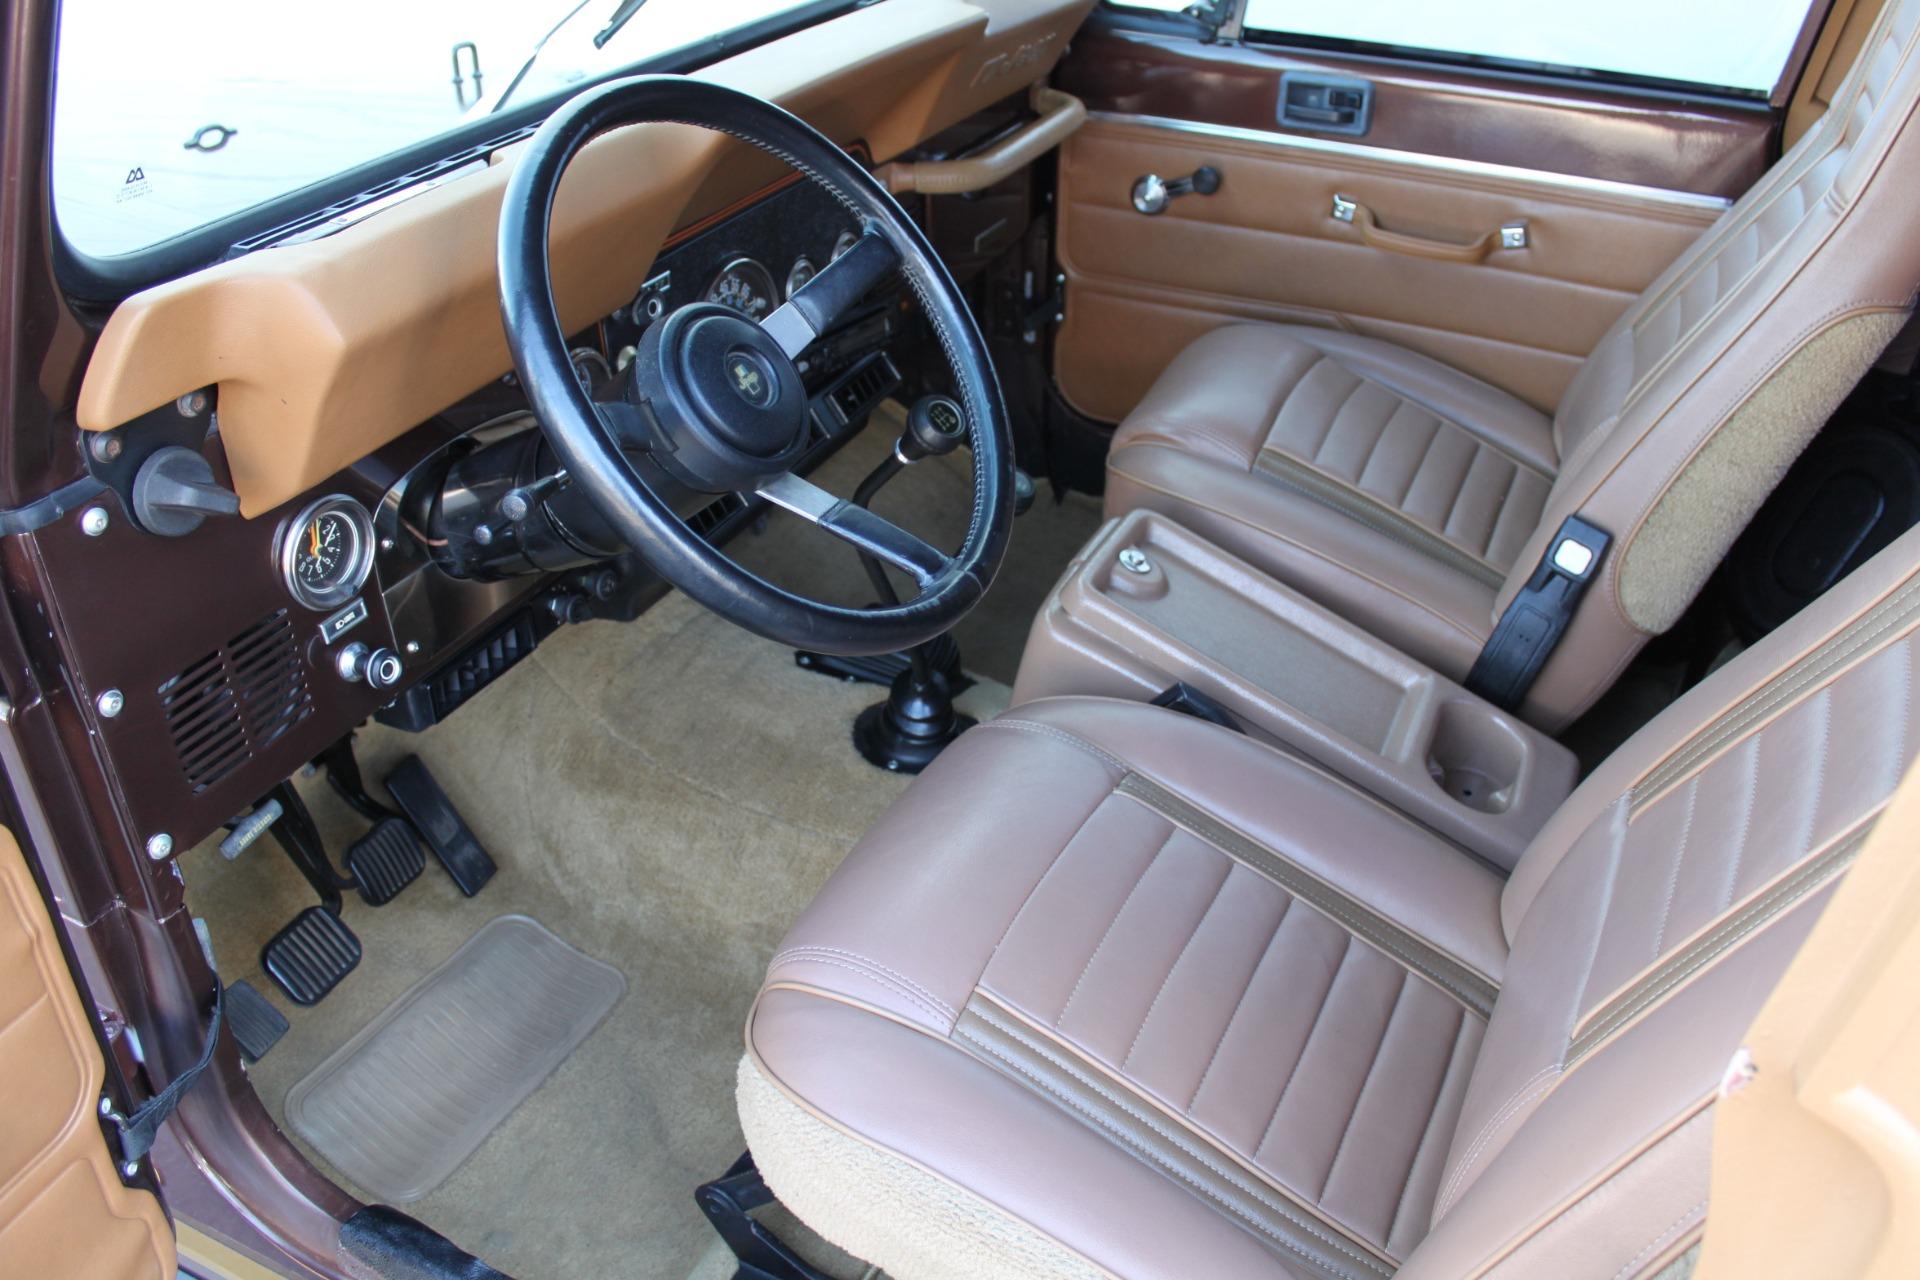 Used-1985-Jeep-CJ-7-Laredo-4WD-vintage